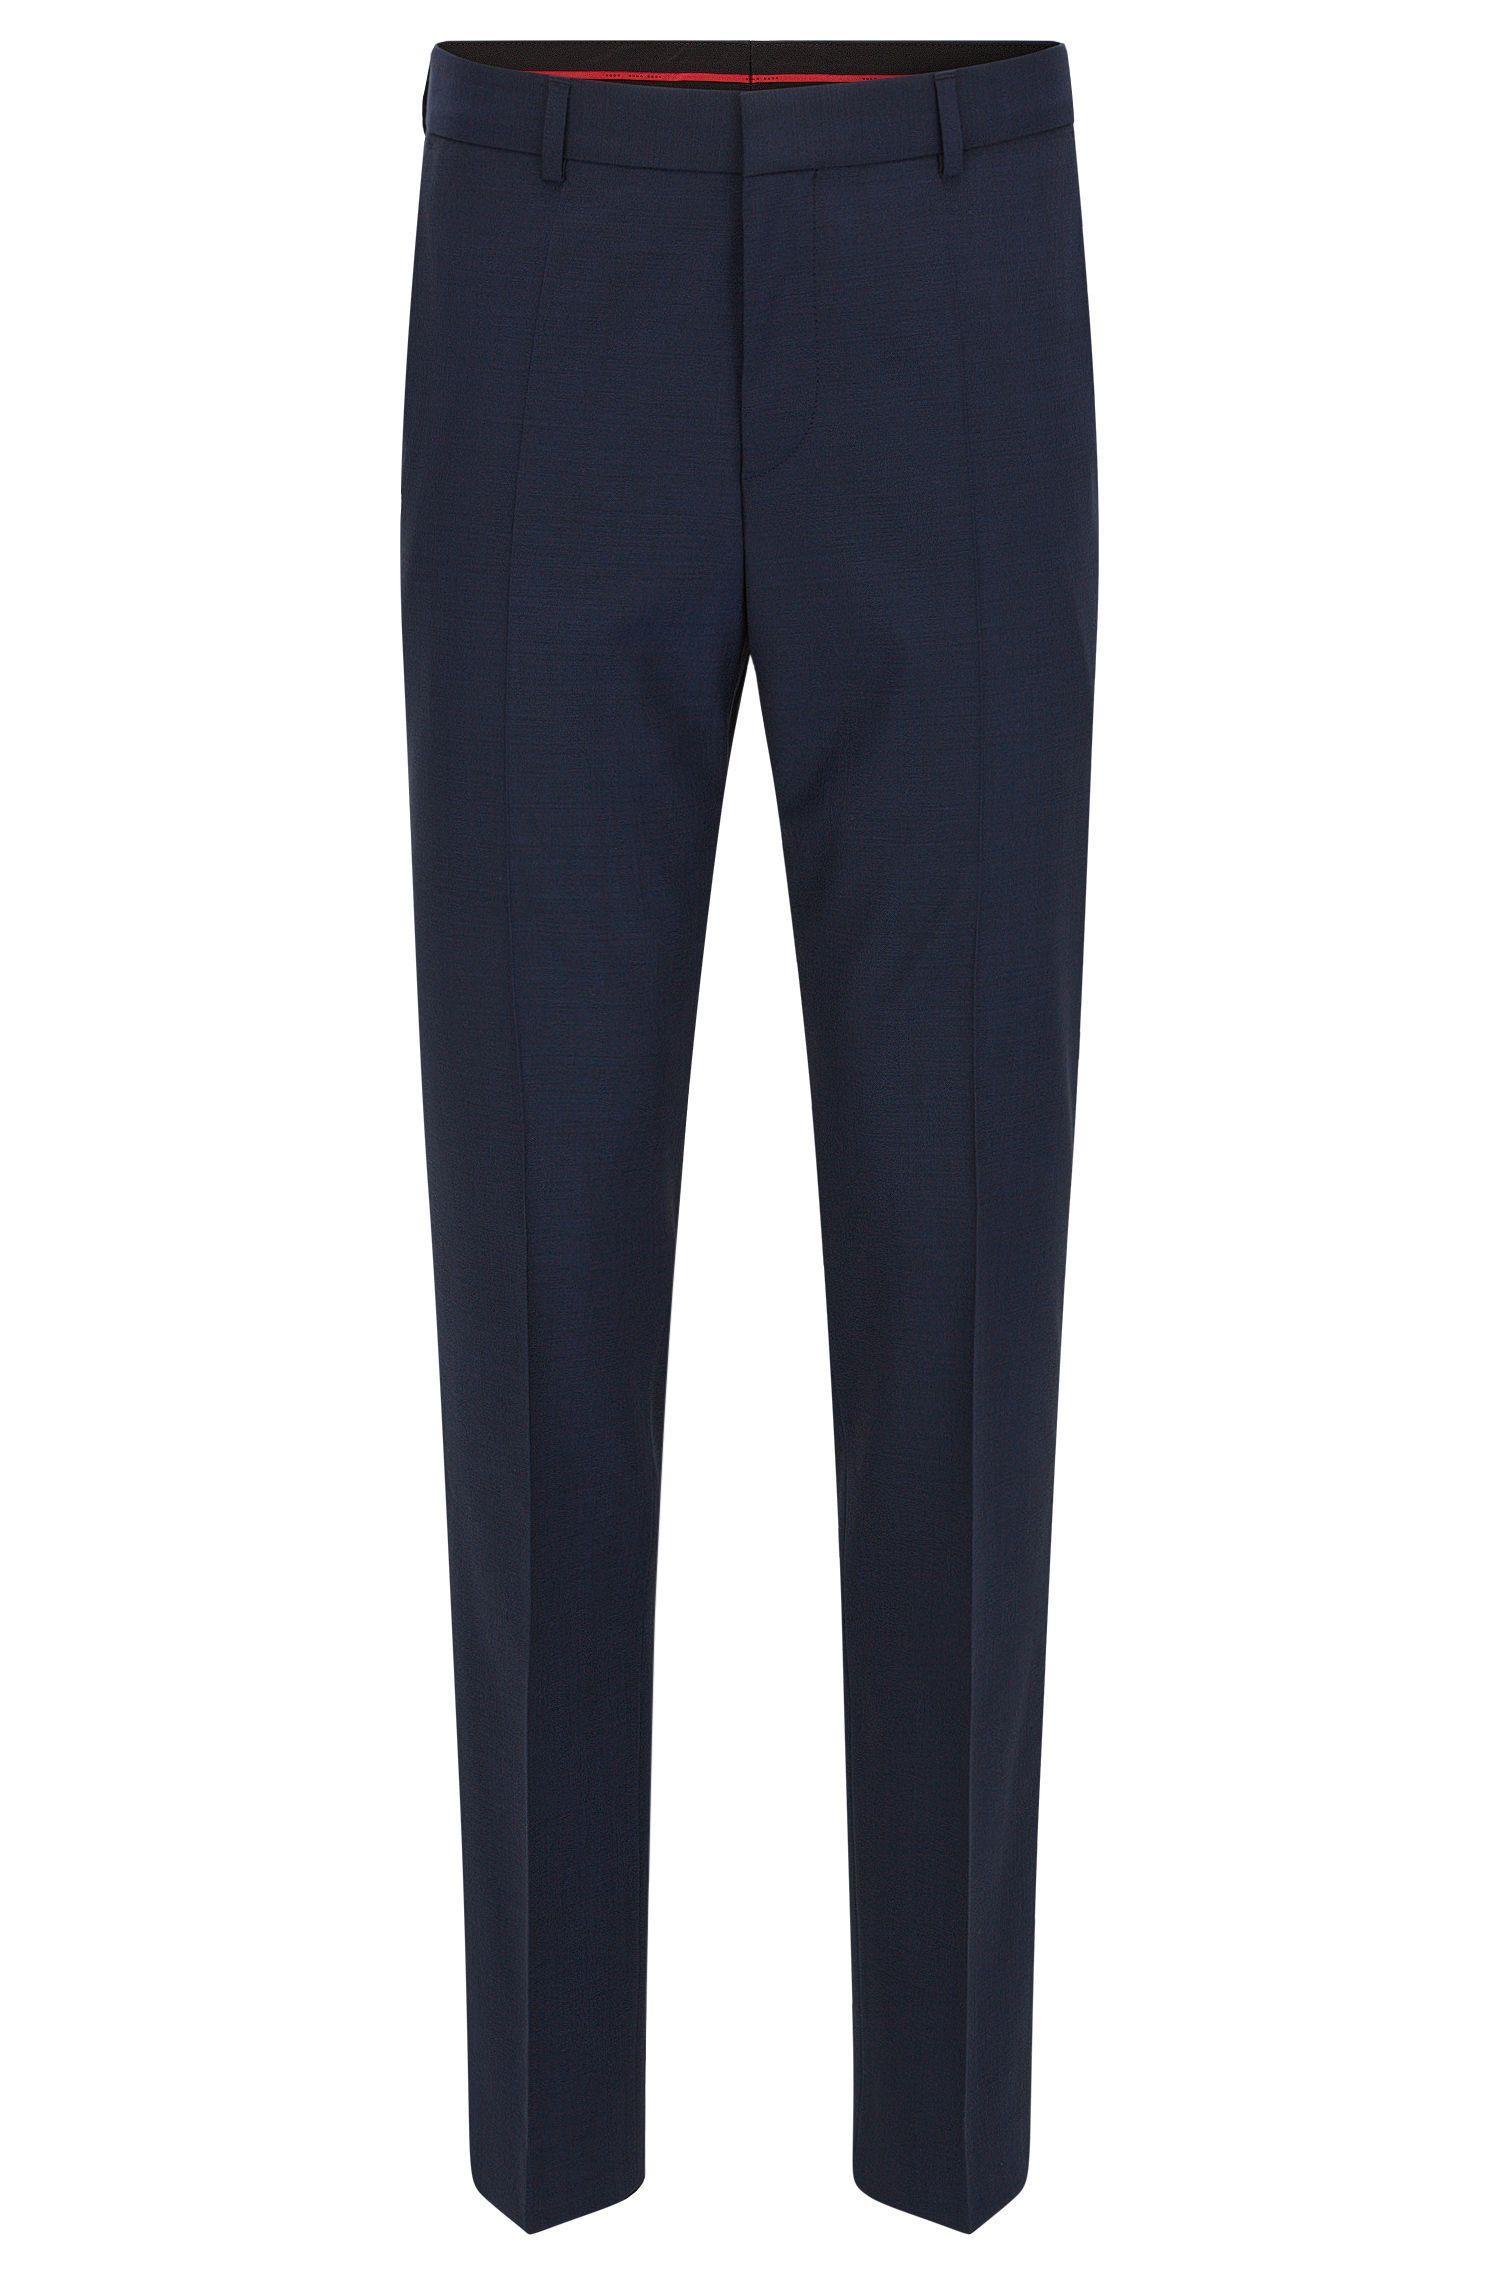 Slim-leg trousers in a wool blend